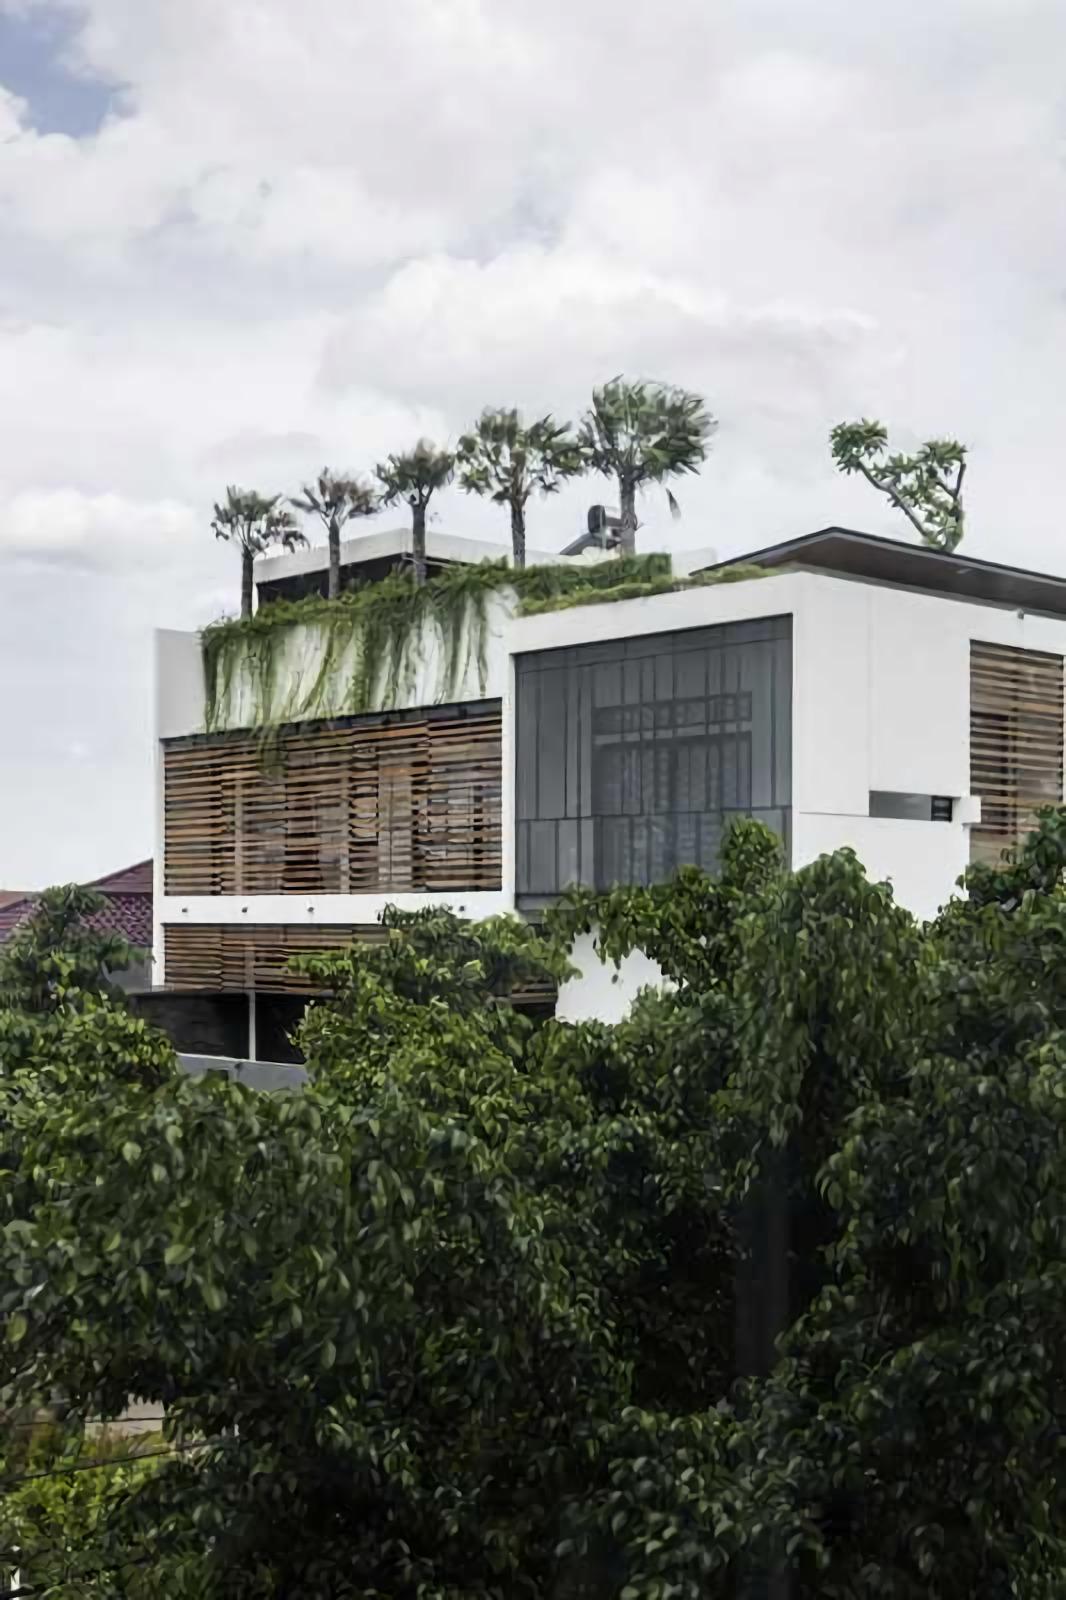 Taman di atap tidak hanya menghadirkan kesejukan dari oksigen yang dihasilkan dan keindahan dari hijaunya dedaunan, namun juga menjadi ciri khas arsitektur rumah tropis minimalis yang unik, elegan, dan bisa menjadi ikon di tengah keorisinilan ide dalam menyikapi lingkungan tropis.